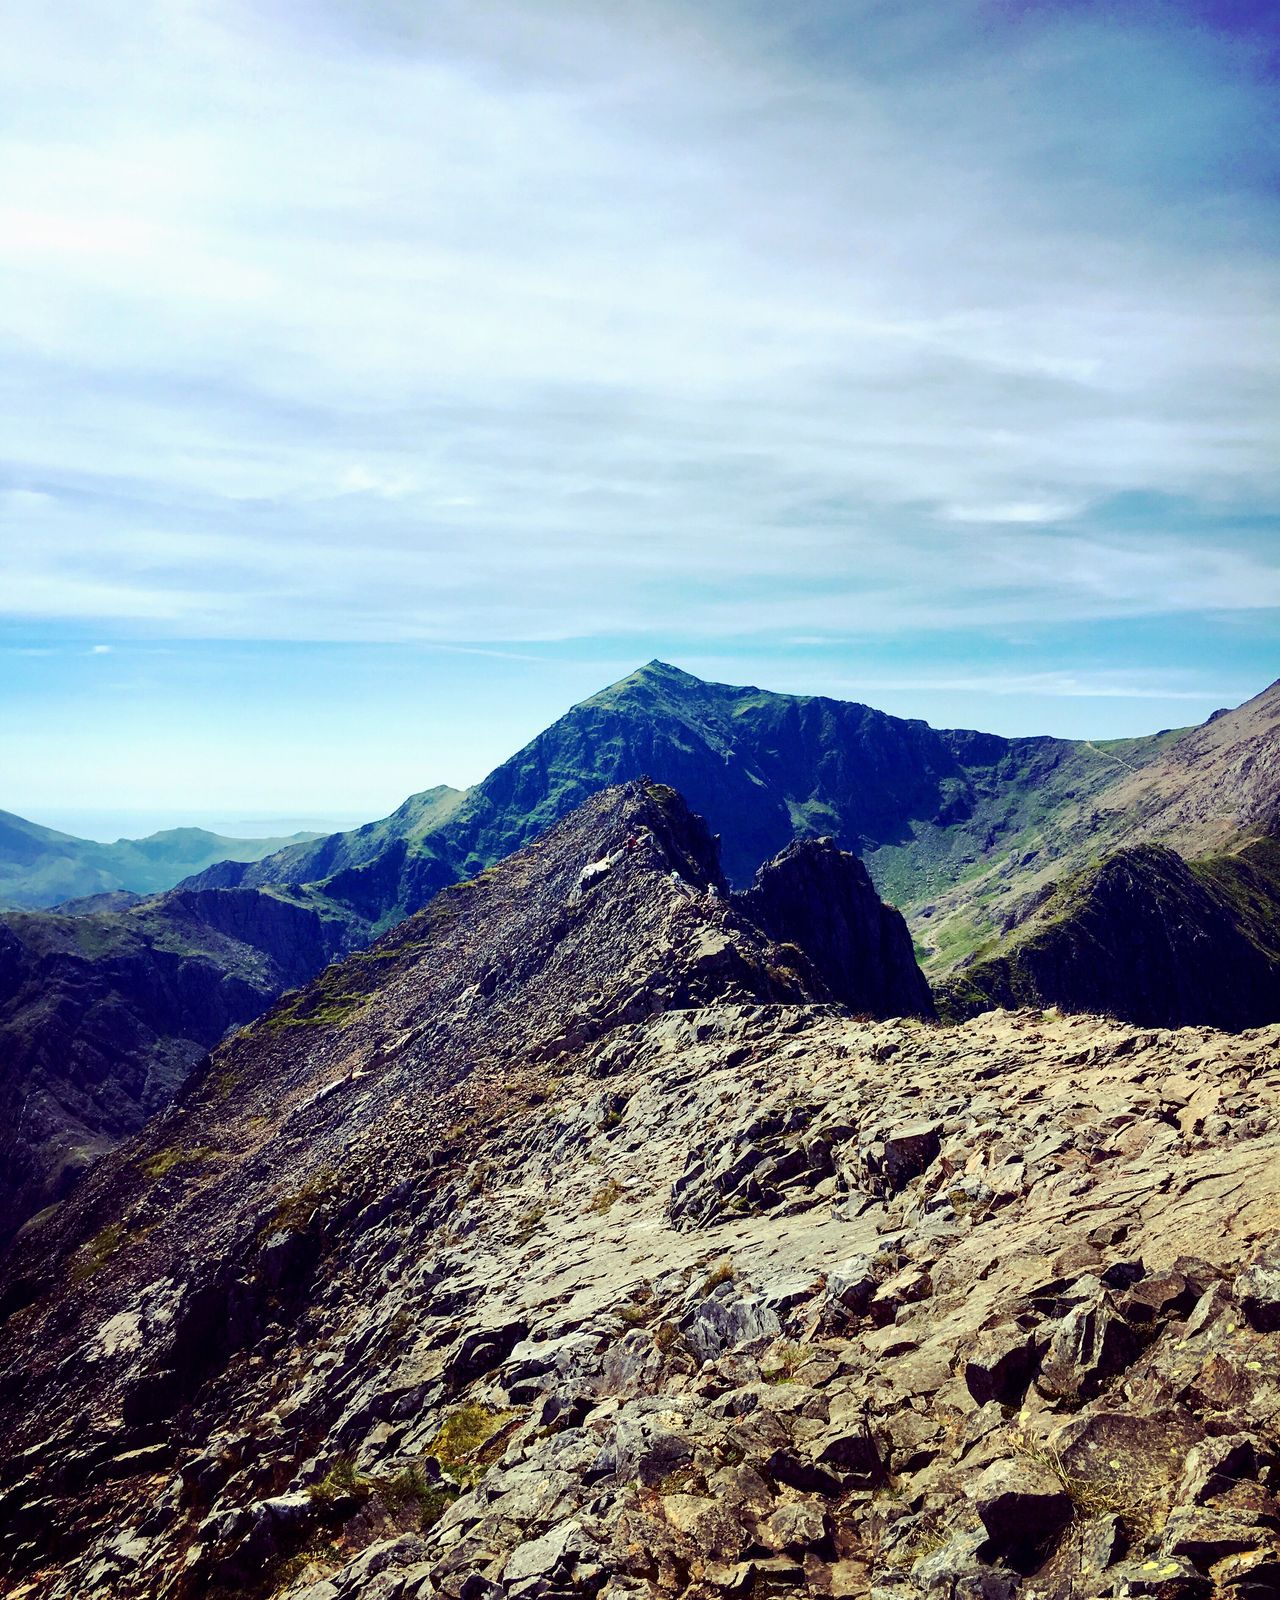 Mountain Life Crib Goch Snowdonia National Park Wales Mountain Hiking Scrambling